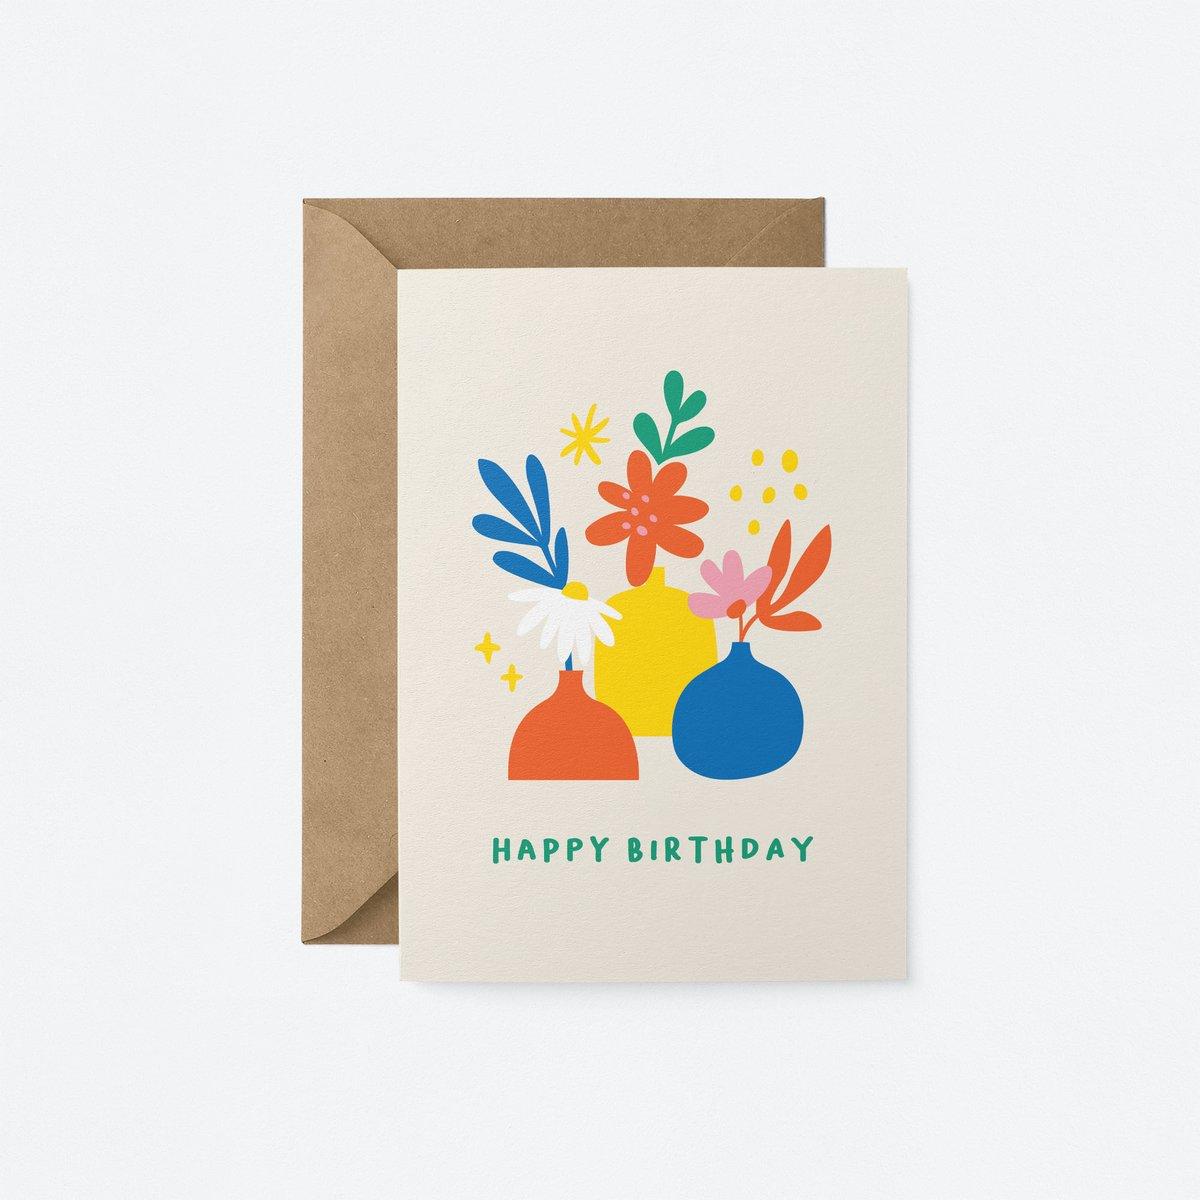 Plantenkamer-graphic-factory-birthday-flowers